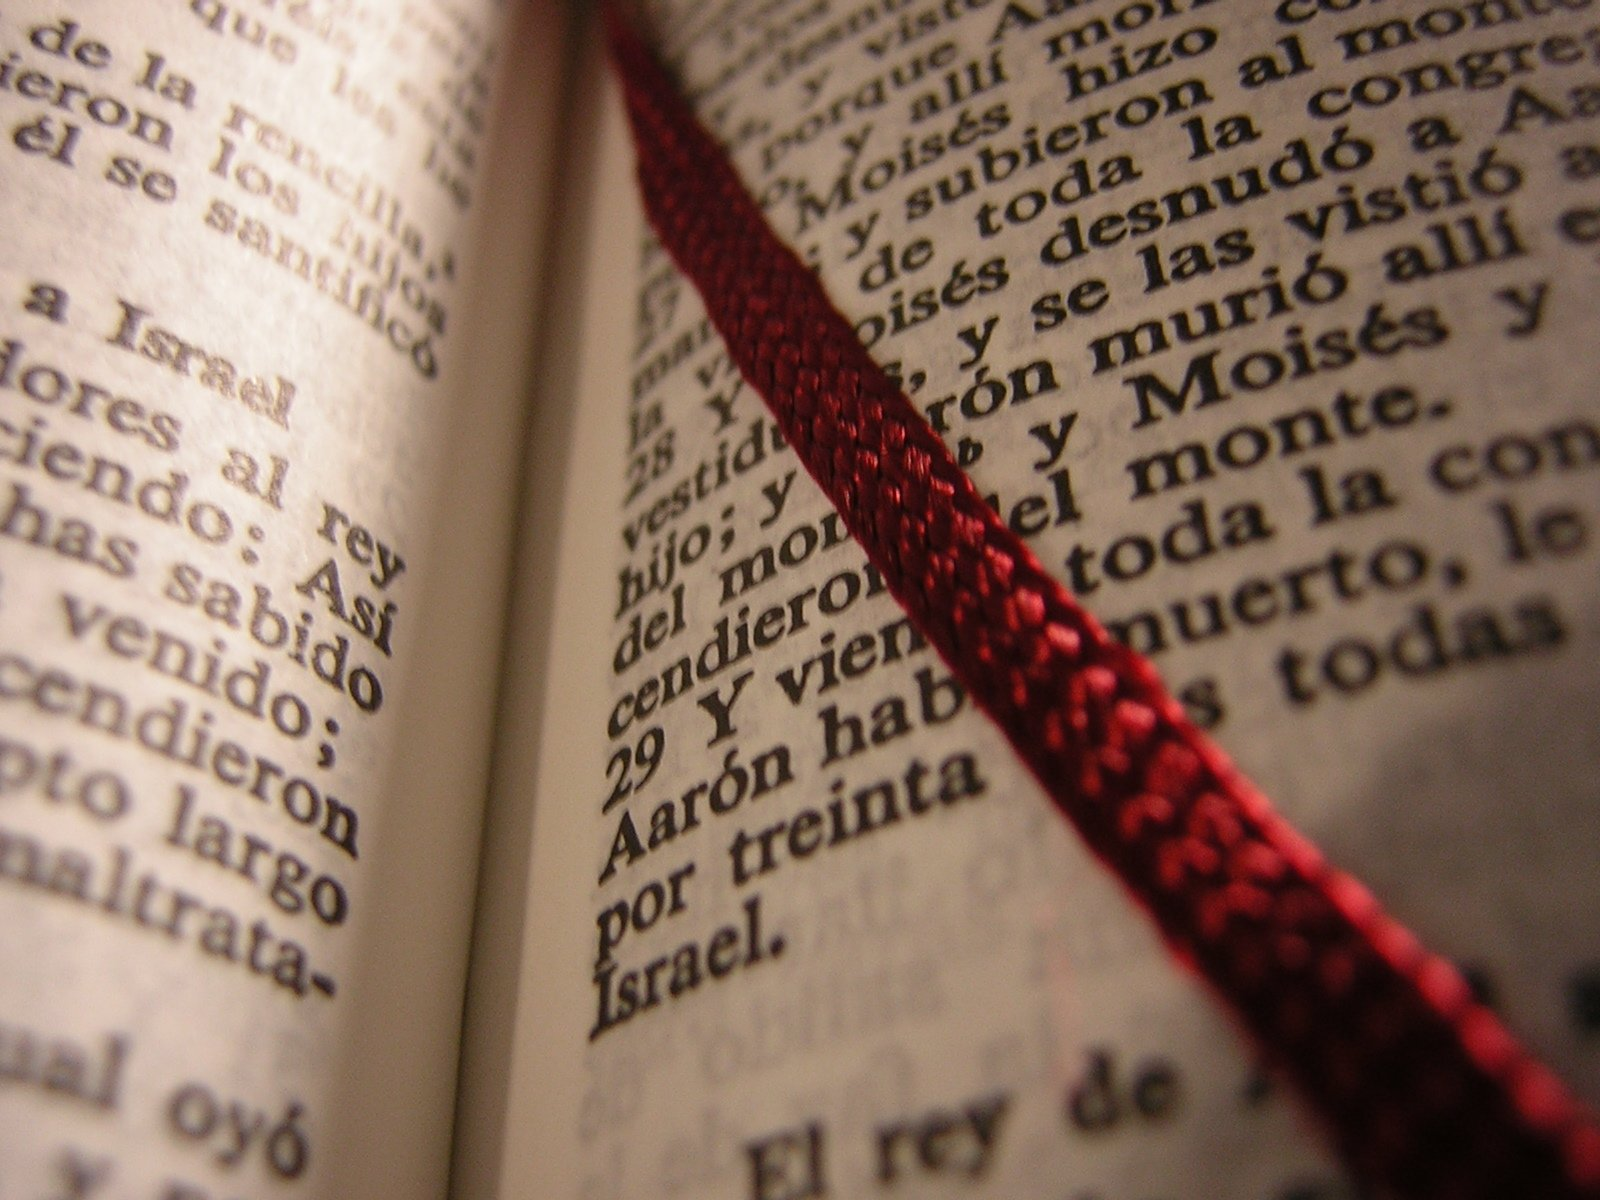 Free Spanish-Language Bible with Bo Stock Photo ...